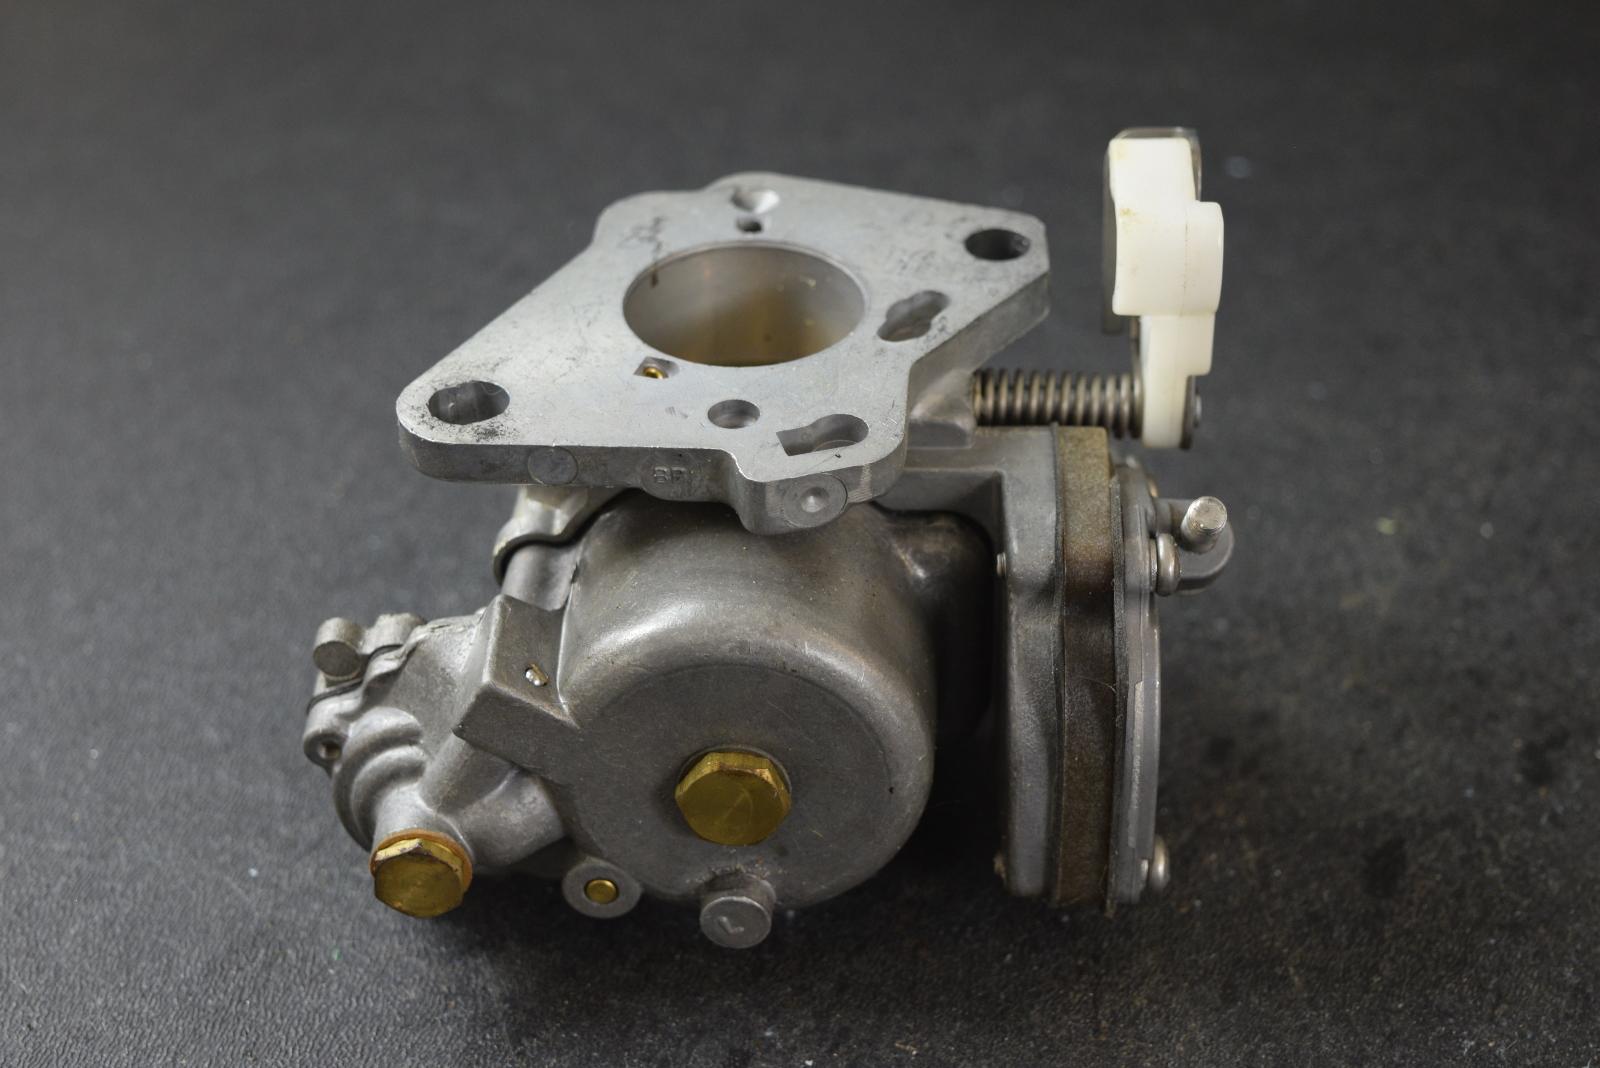 Crb R Refurbished Mercury Mariner Carburetor T Wmc Hp on 15 Hp Mercury Outboard Carburetor